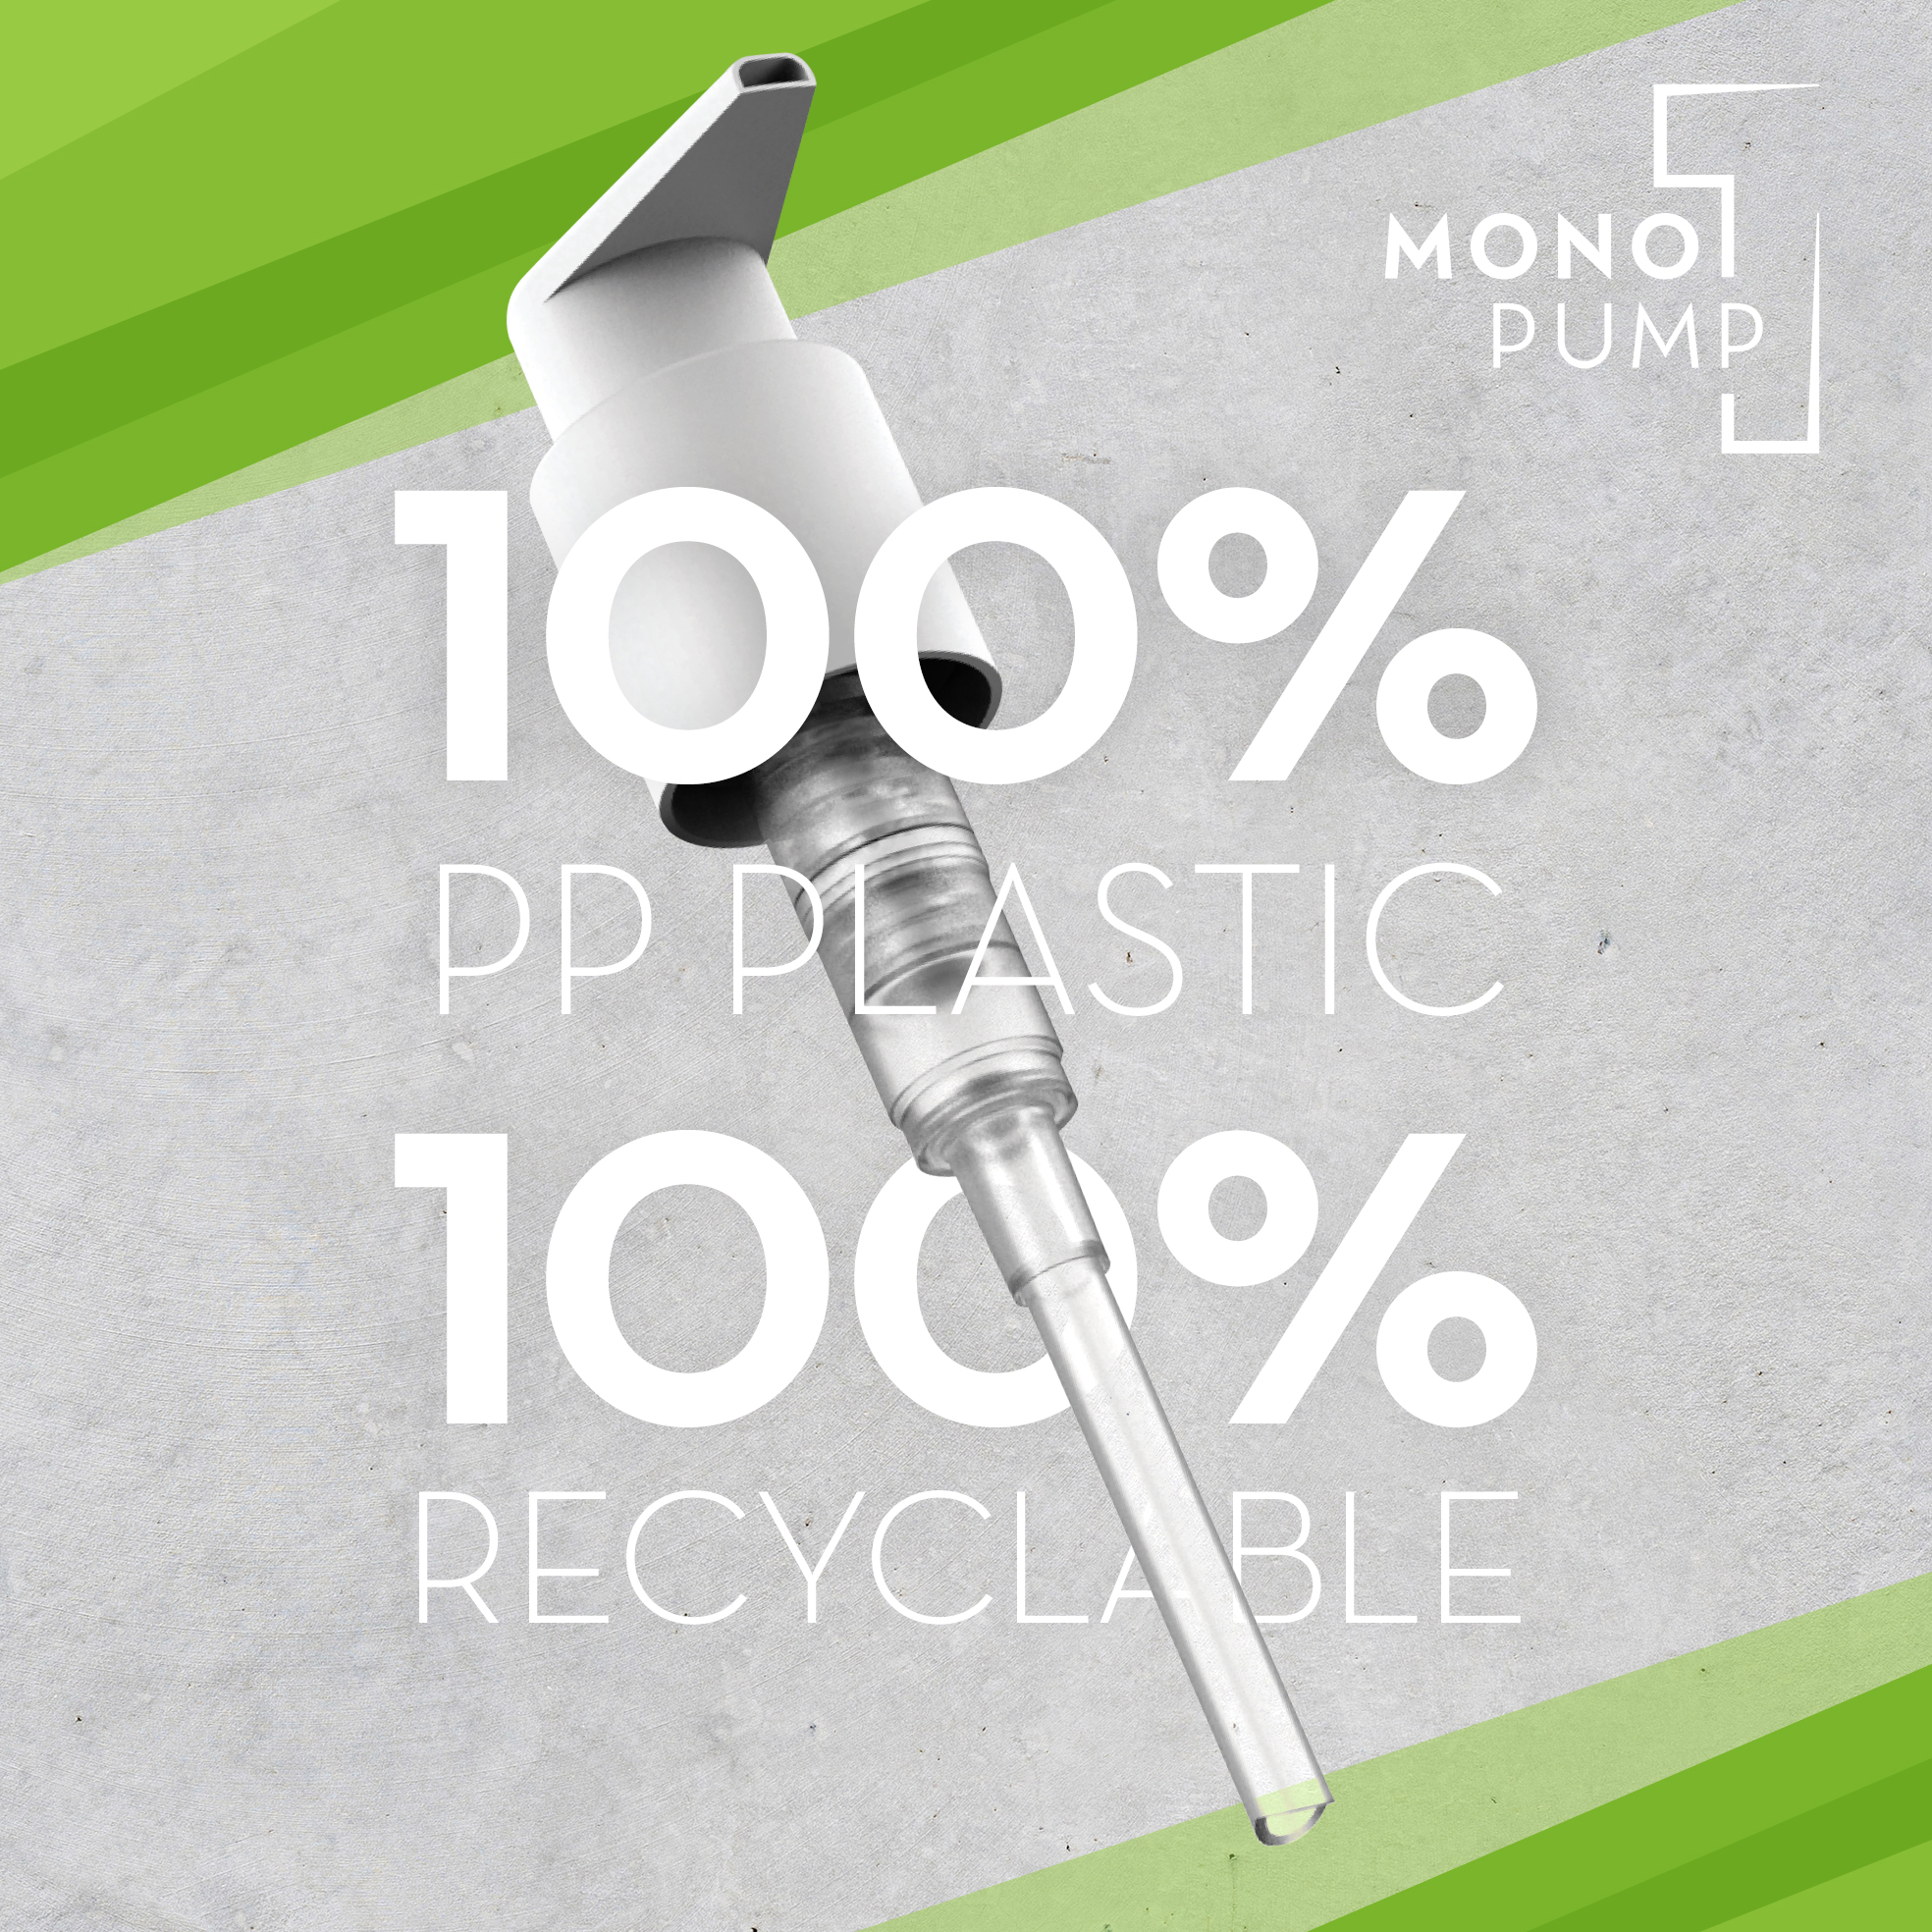 Mono pump sustainable Fasten